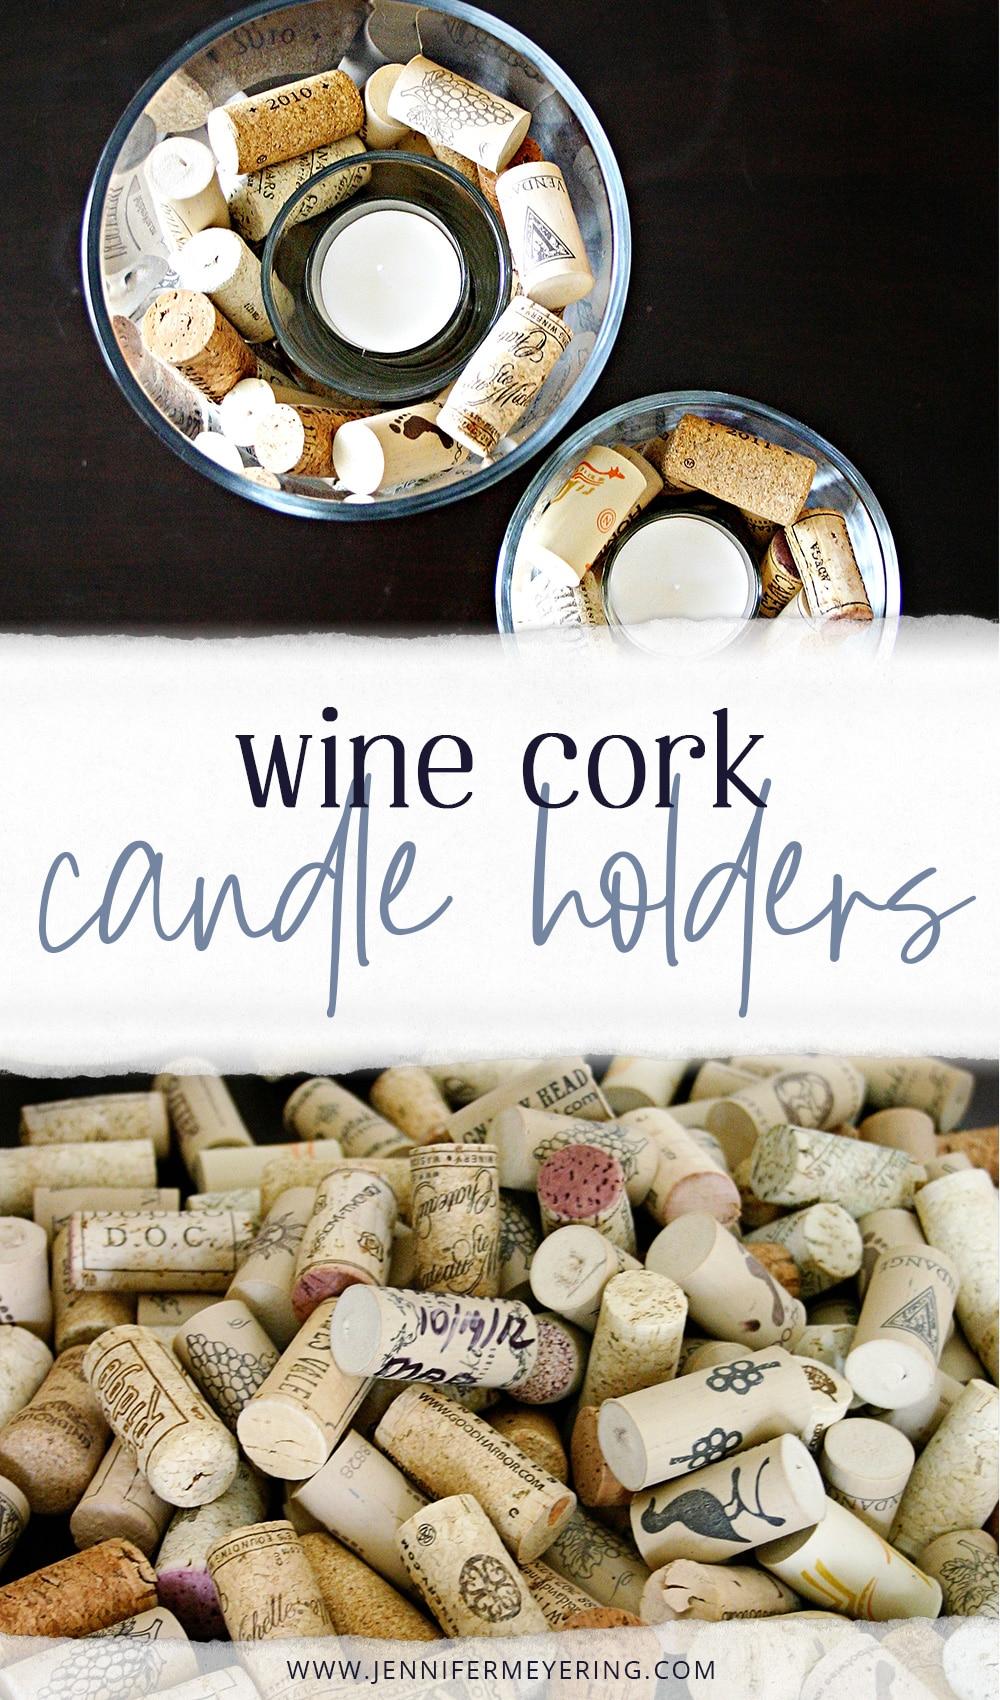 Wine Cork Candle Holders - JenniferMeyering.com